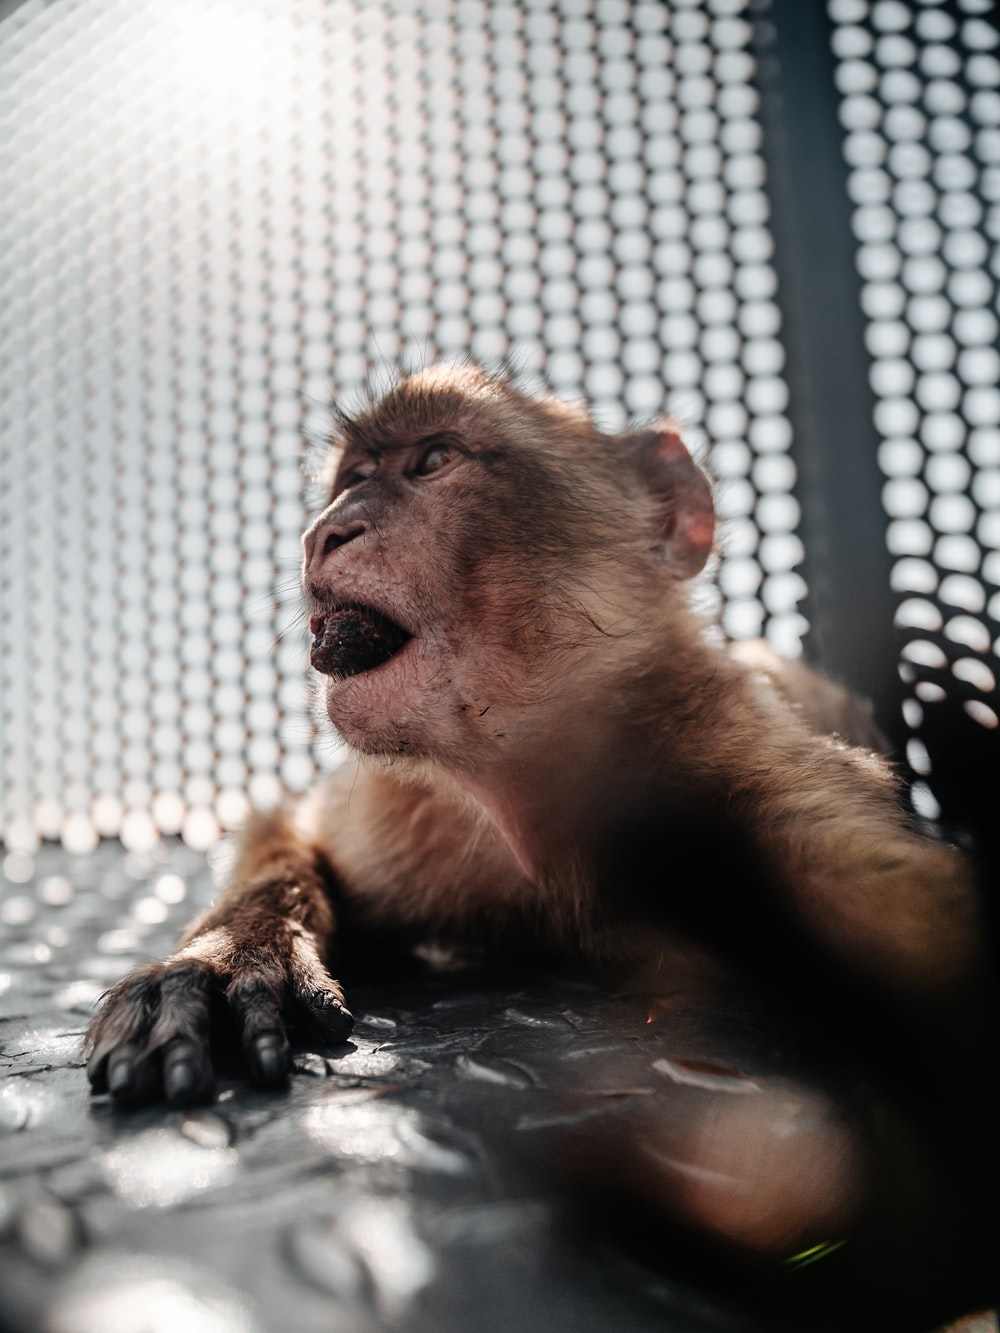 brown monkey on white net